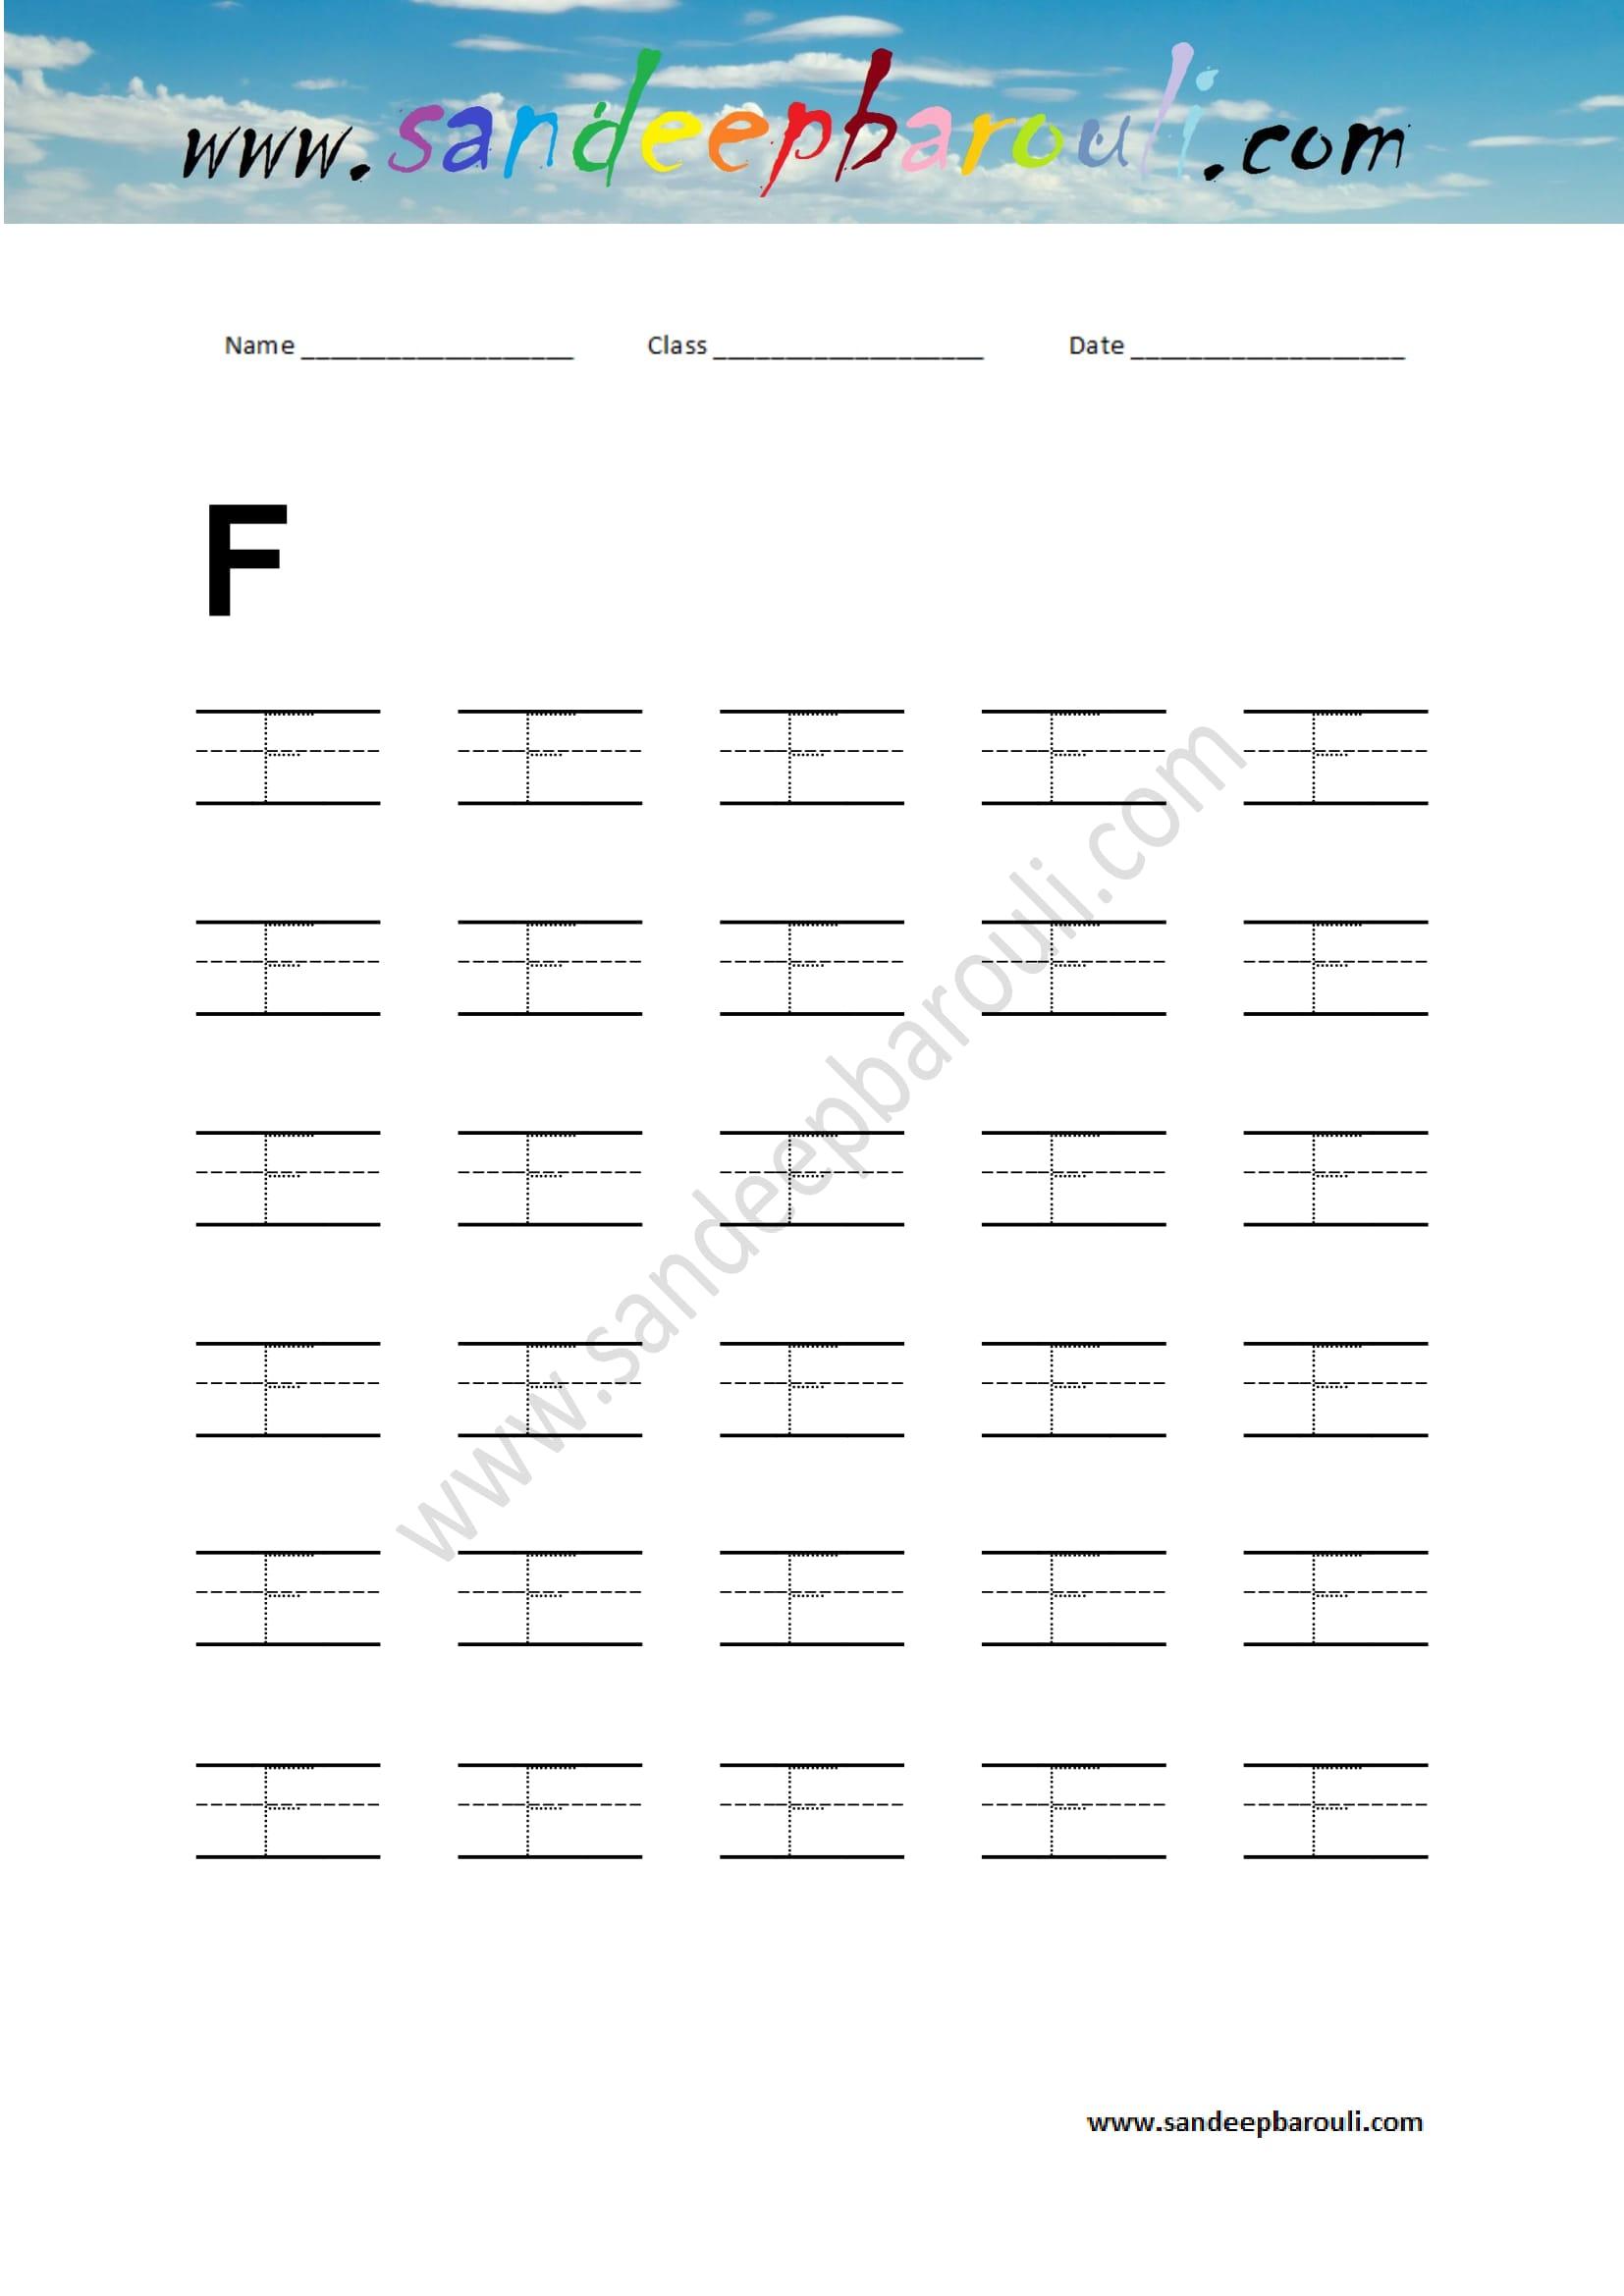 Handwriting Practice Letter F Sandeepbarouli